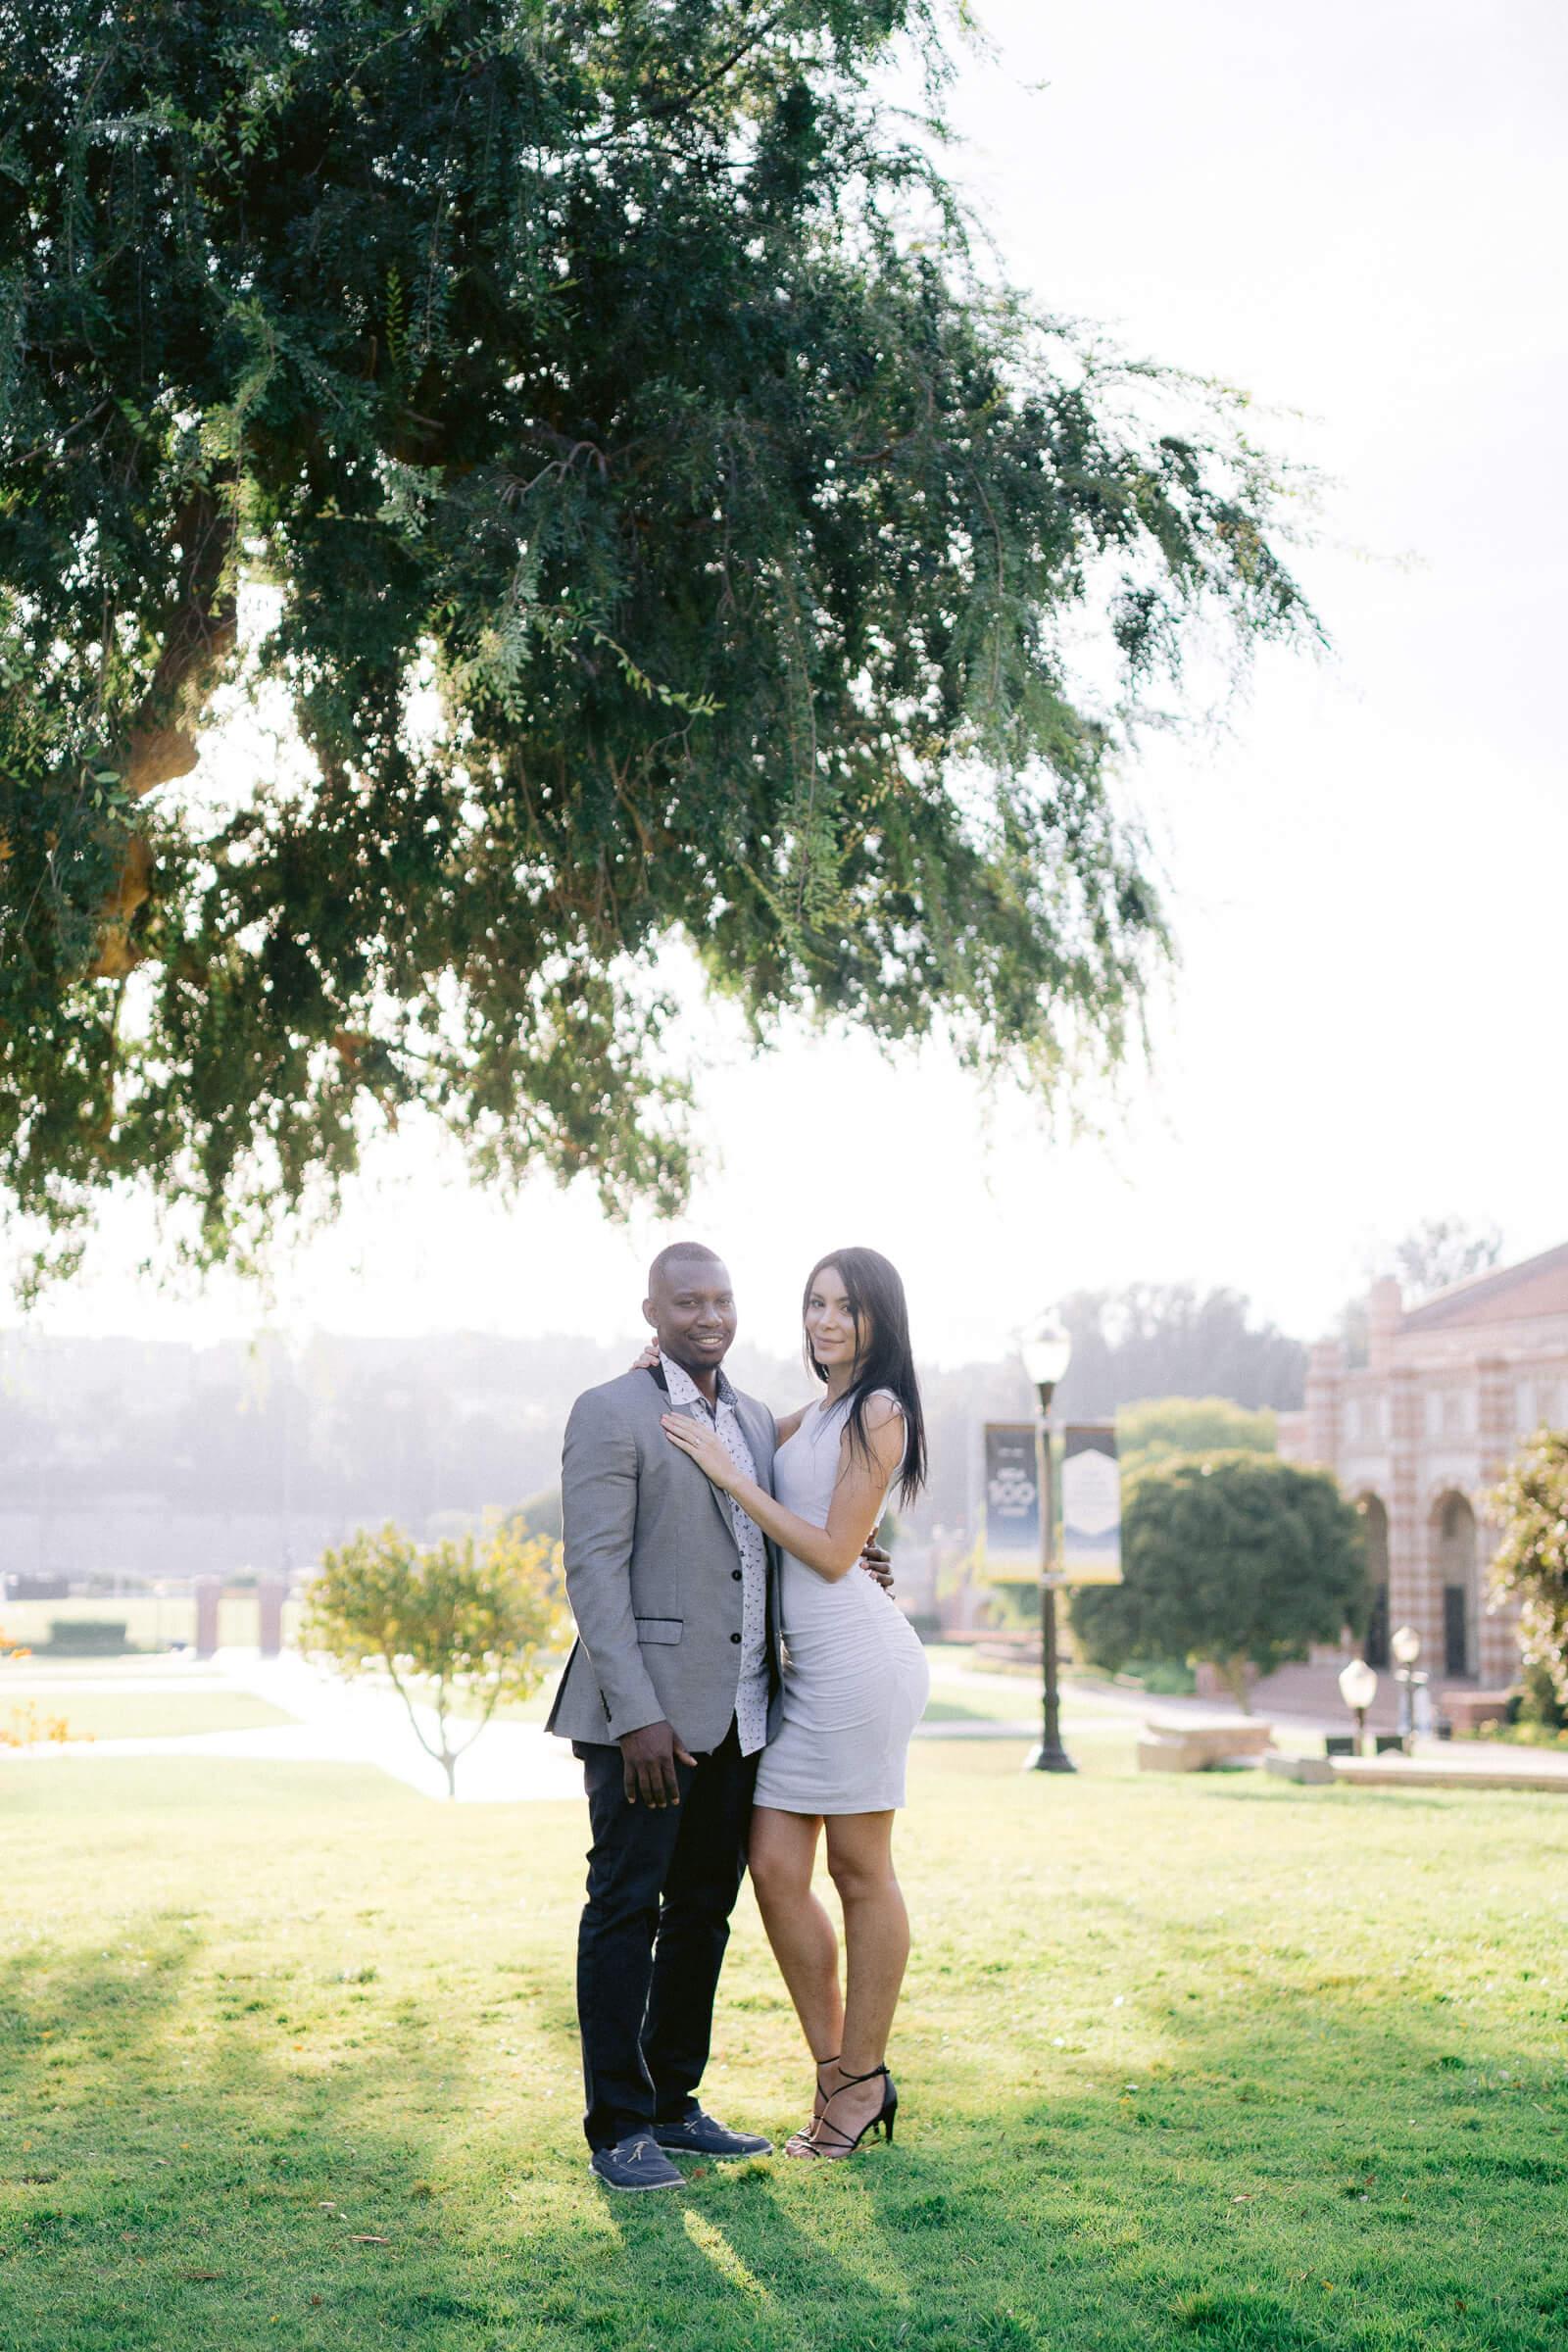 ucla-los-angeles-proposal-photographer-37.jpg